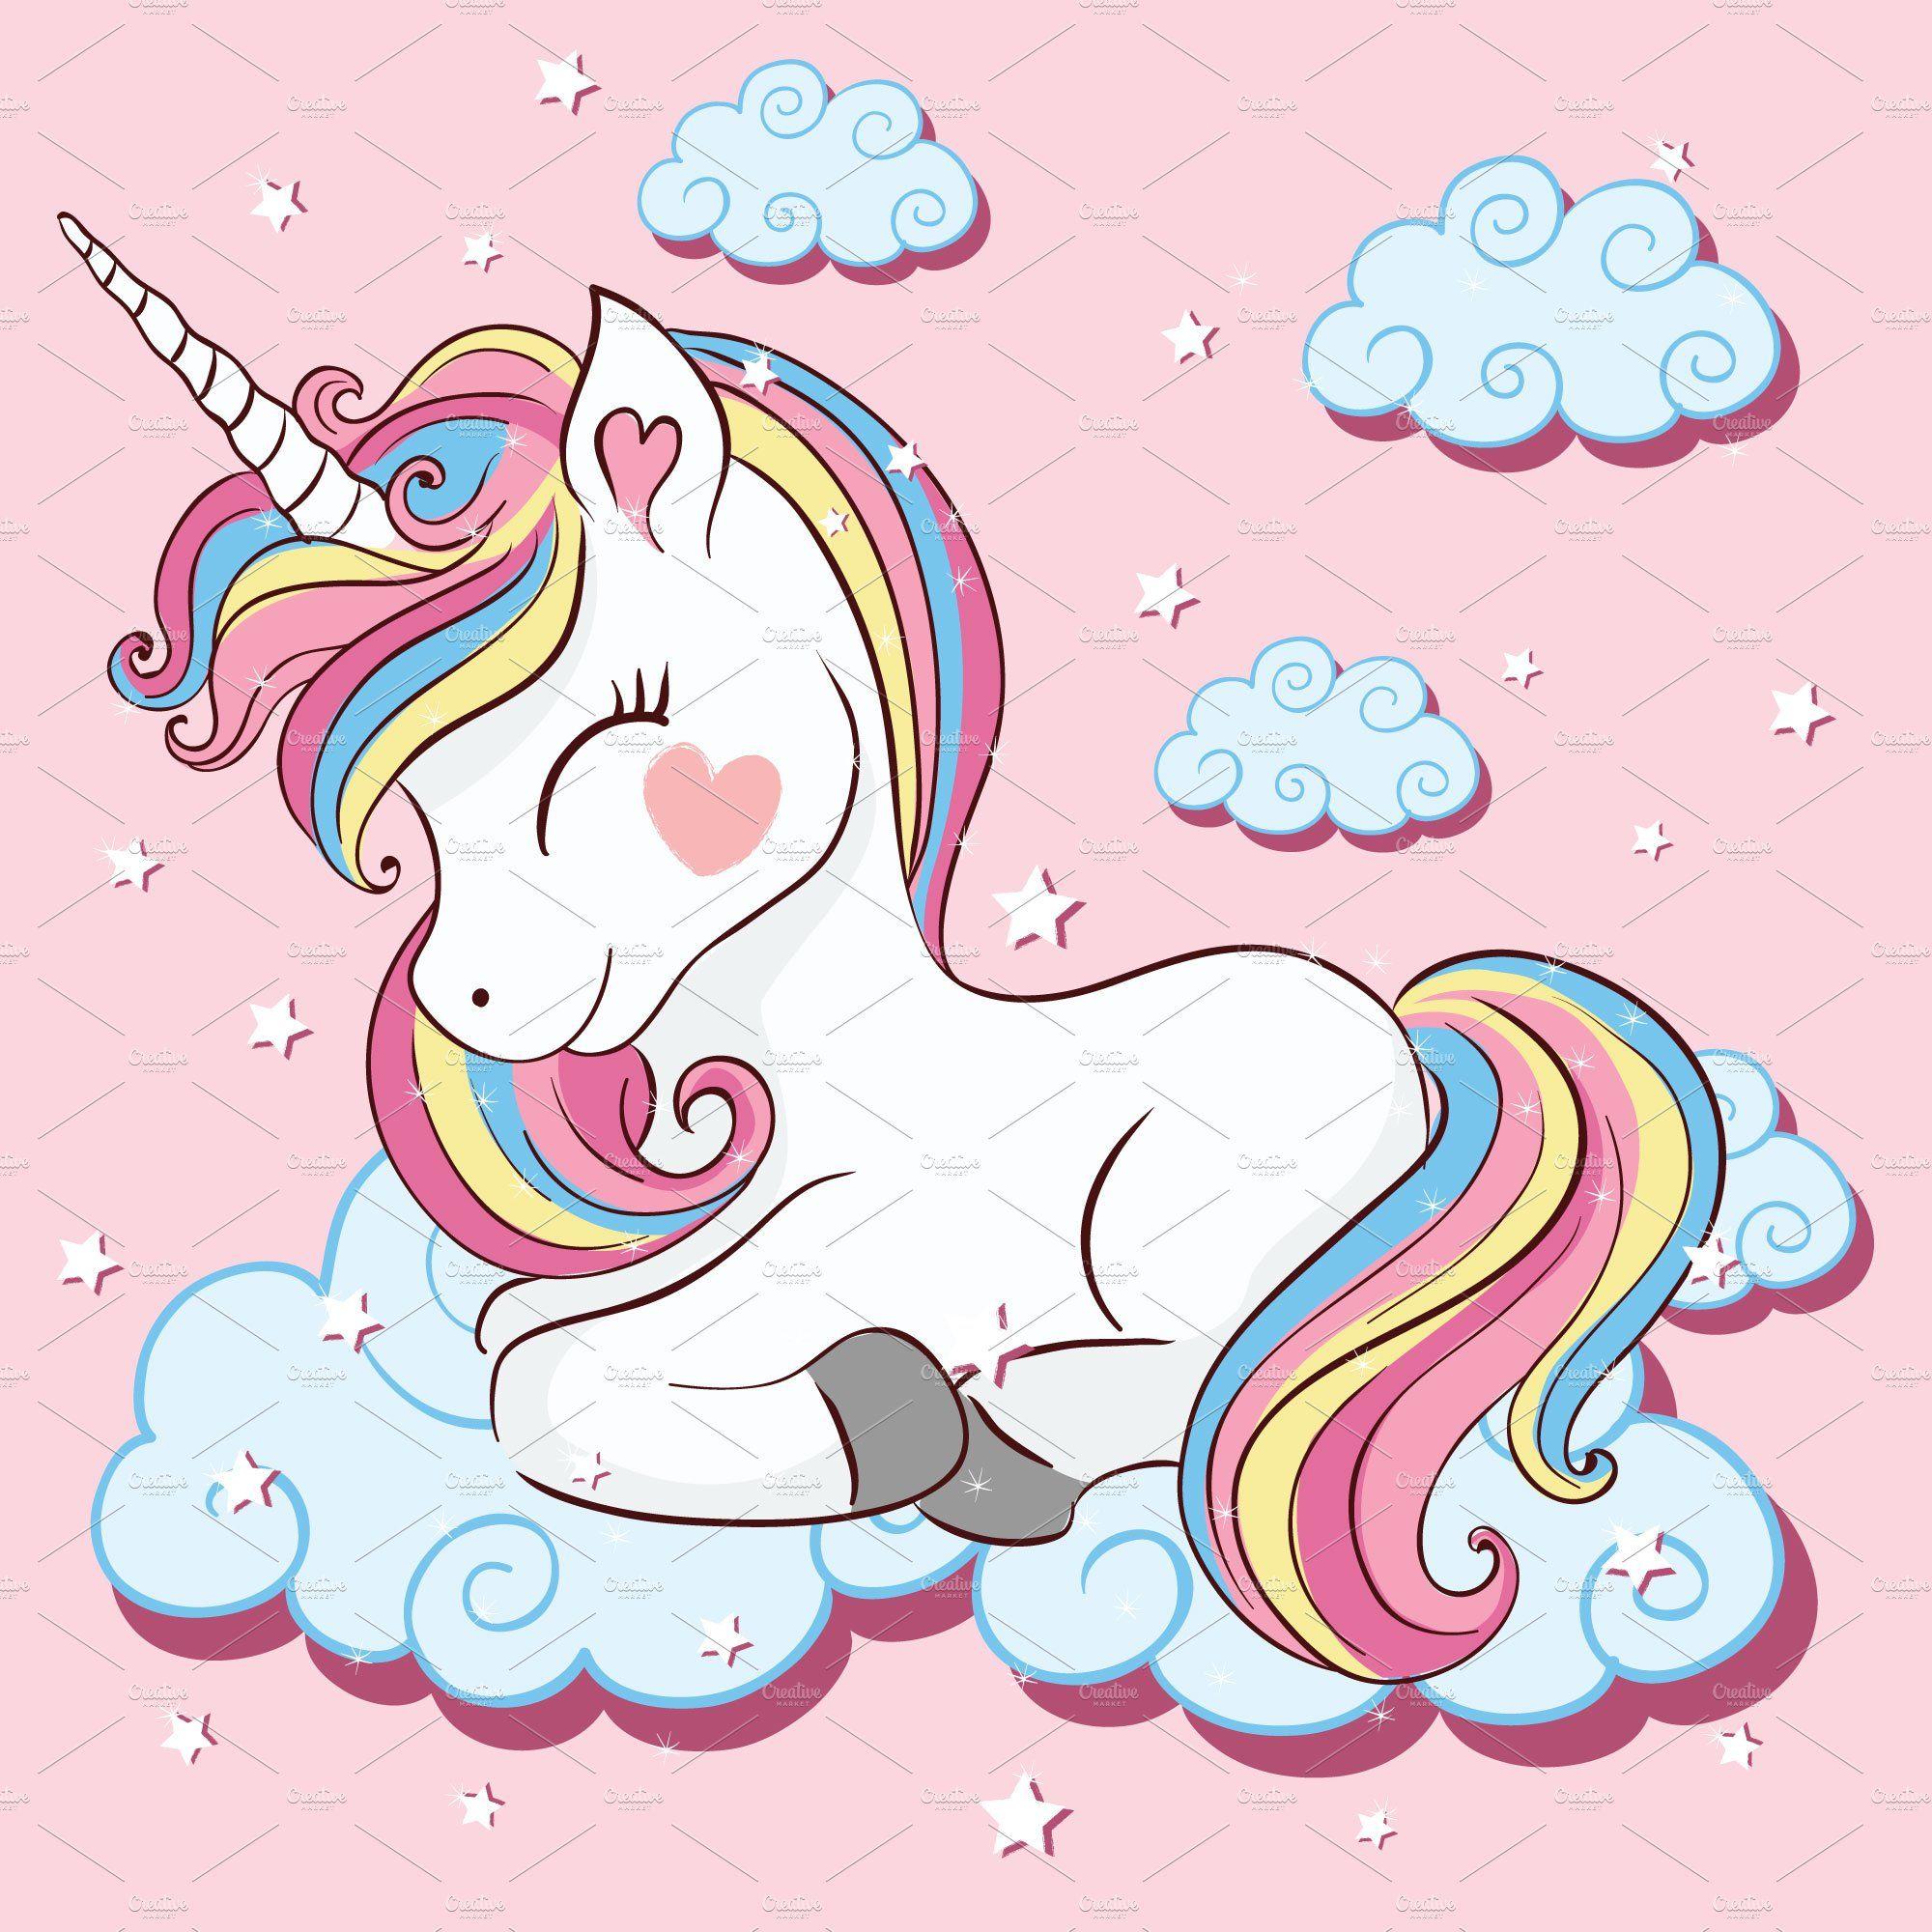 10 Cute Unicorn Cartoon Vector Unicorn Illustration Unicorn Wallpaper Cute Unicorn Images